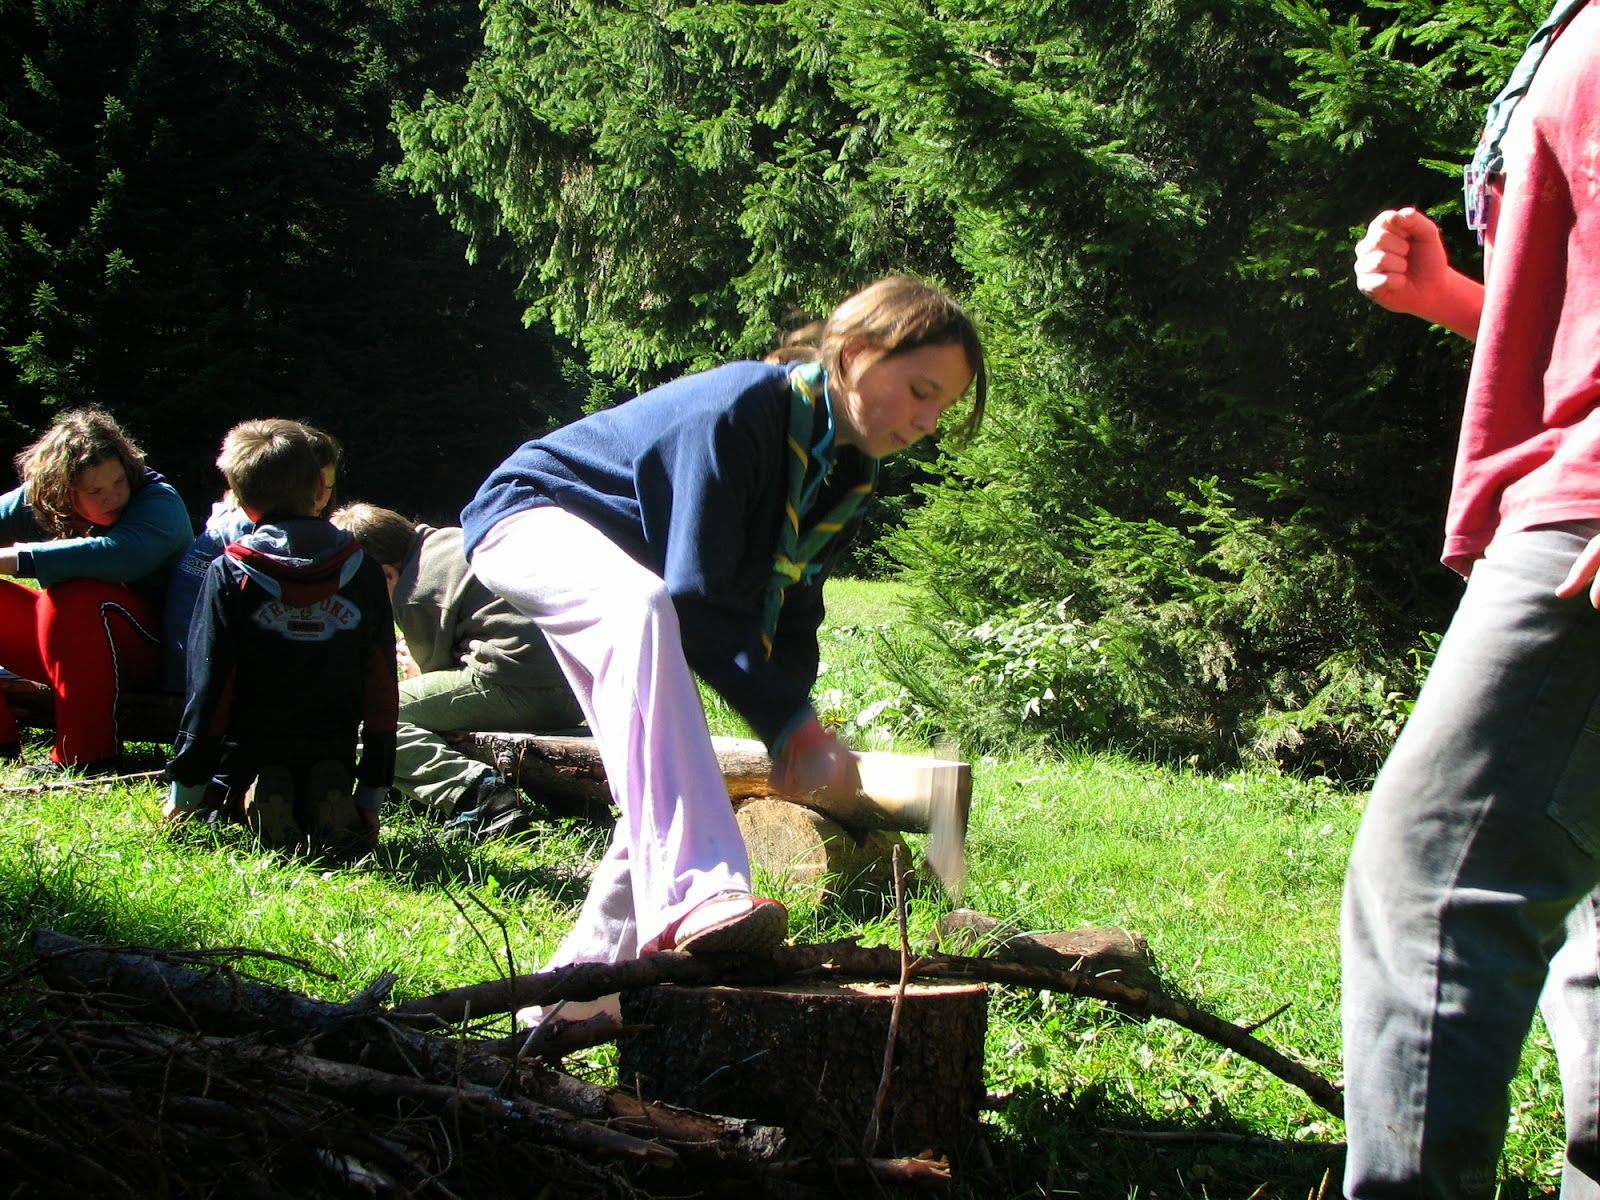 Vodov izlet, Ilirska Bistrica 2005 - Picture%2B136.jpg